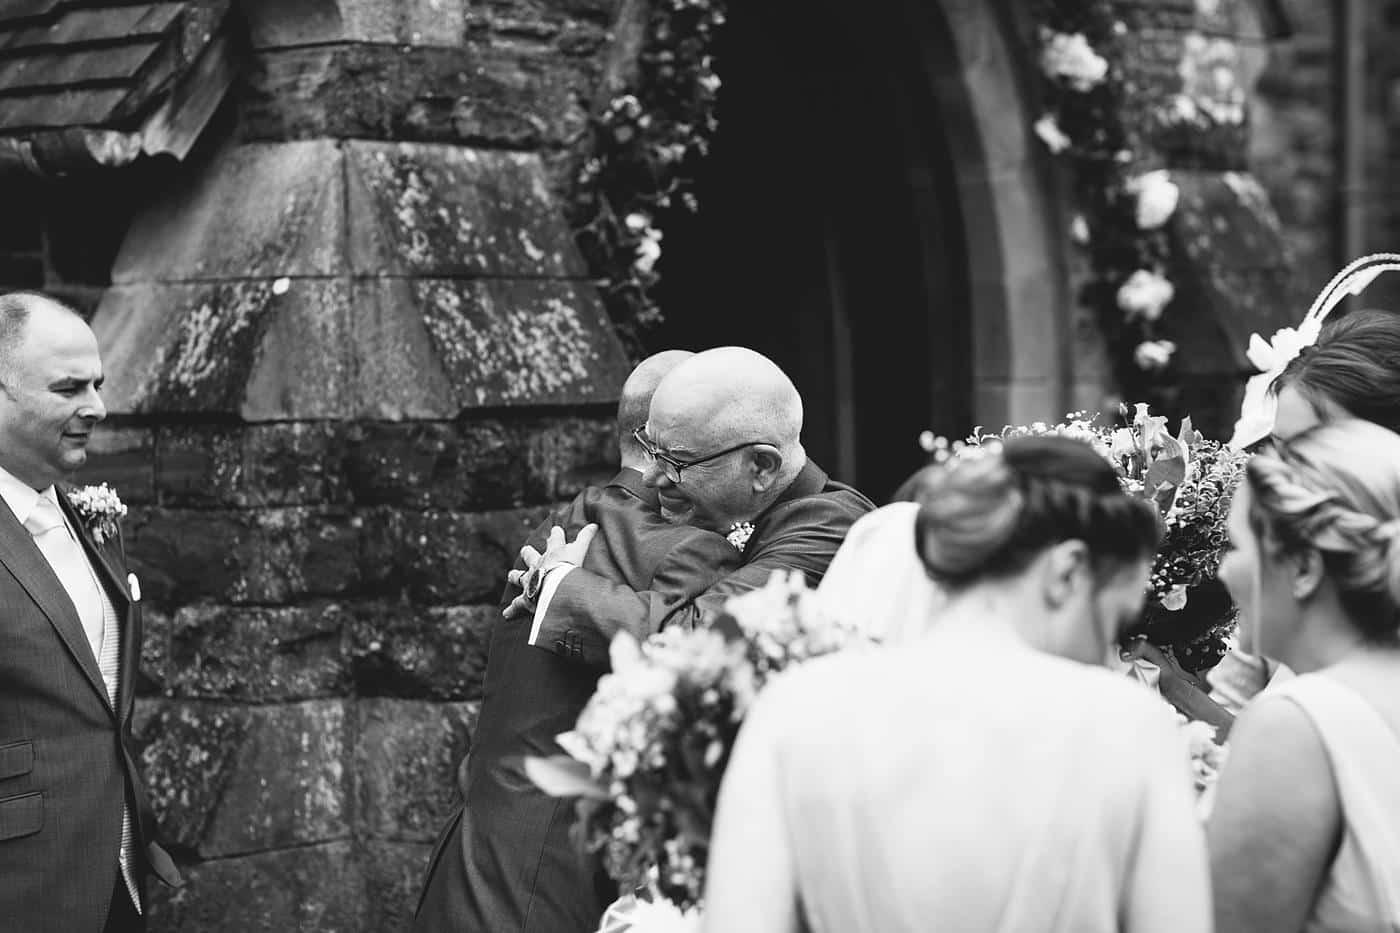 Winstanstow wedding photography 0488